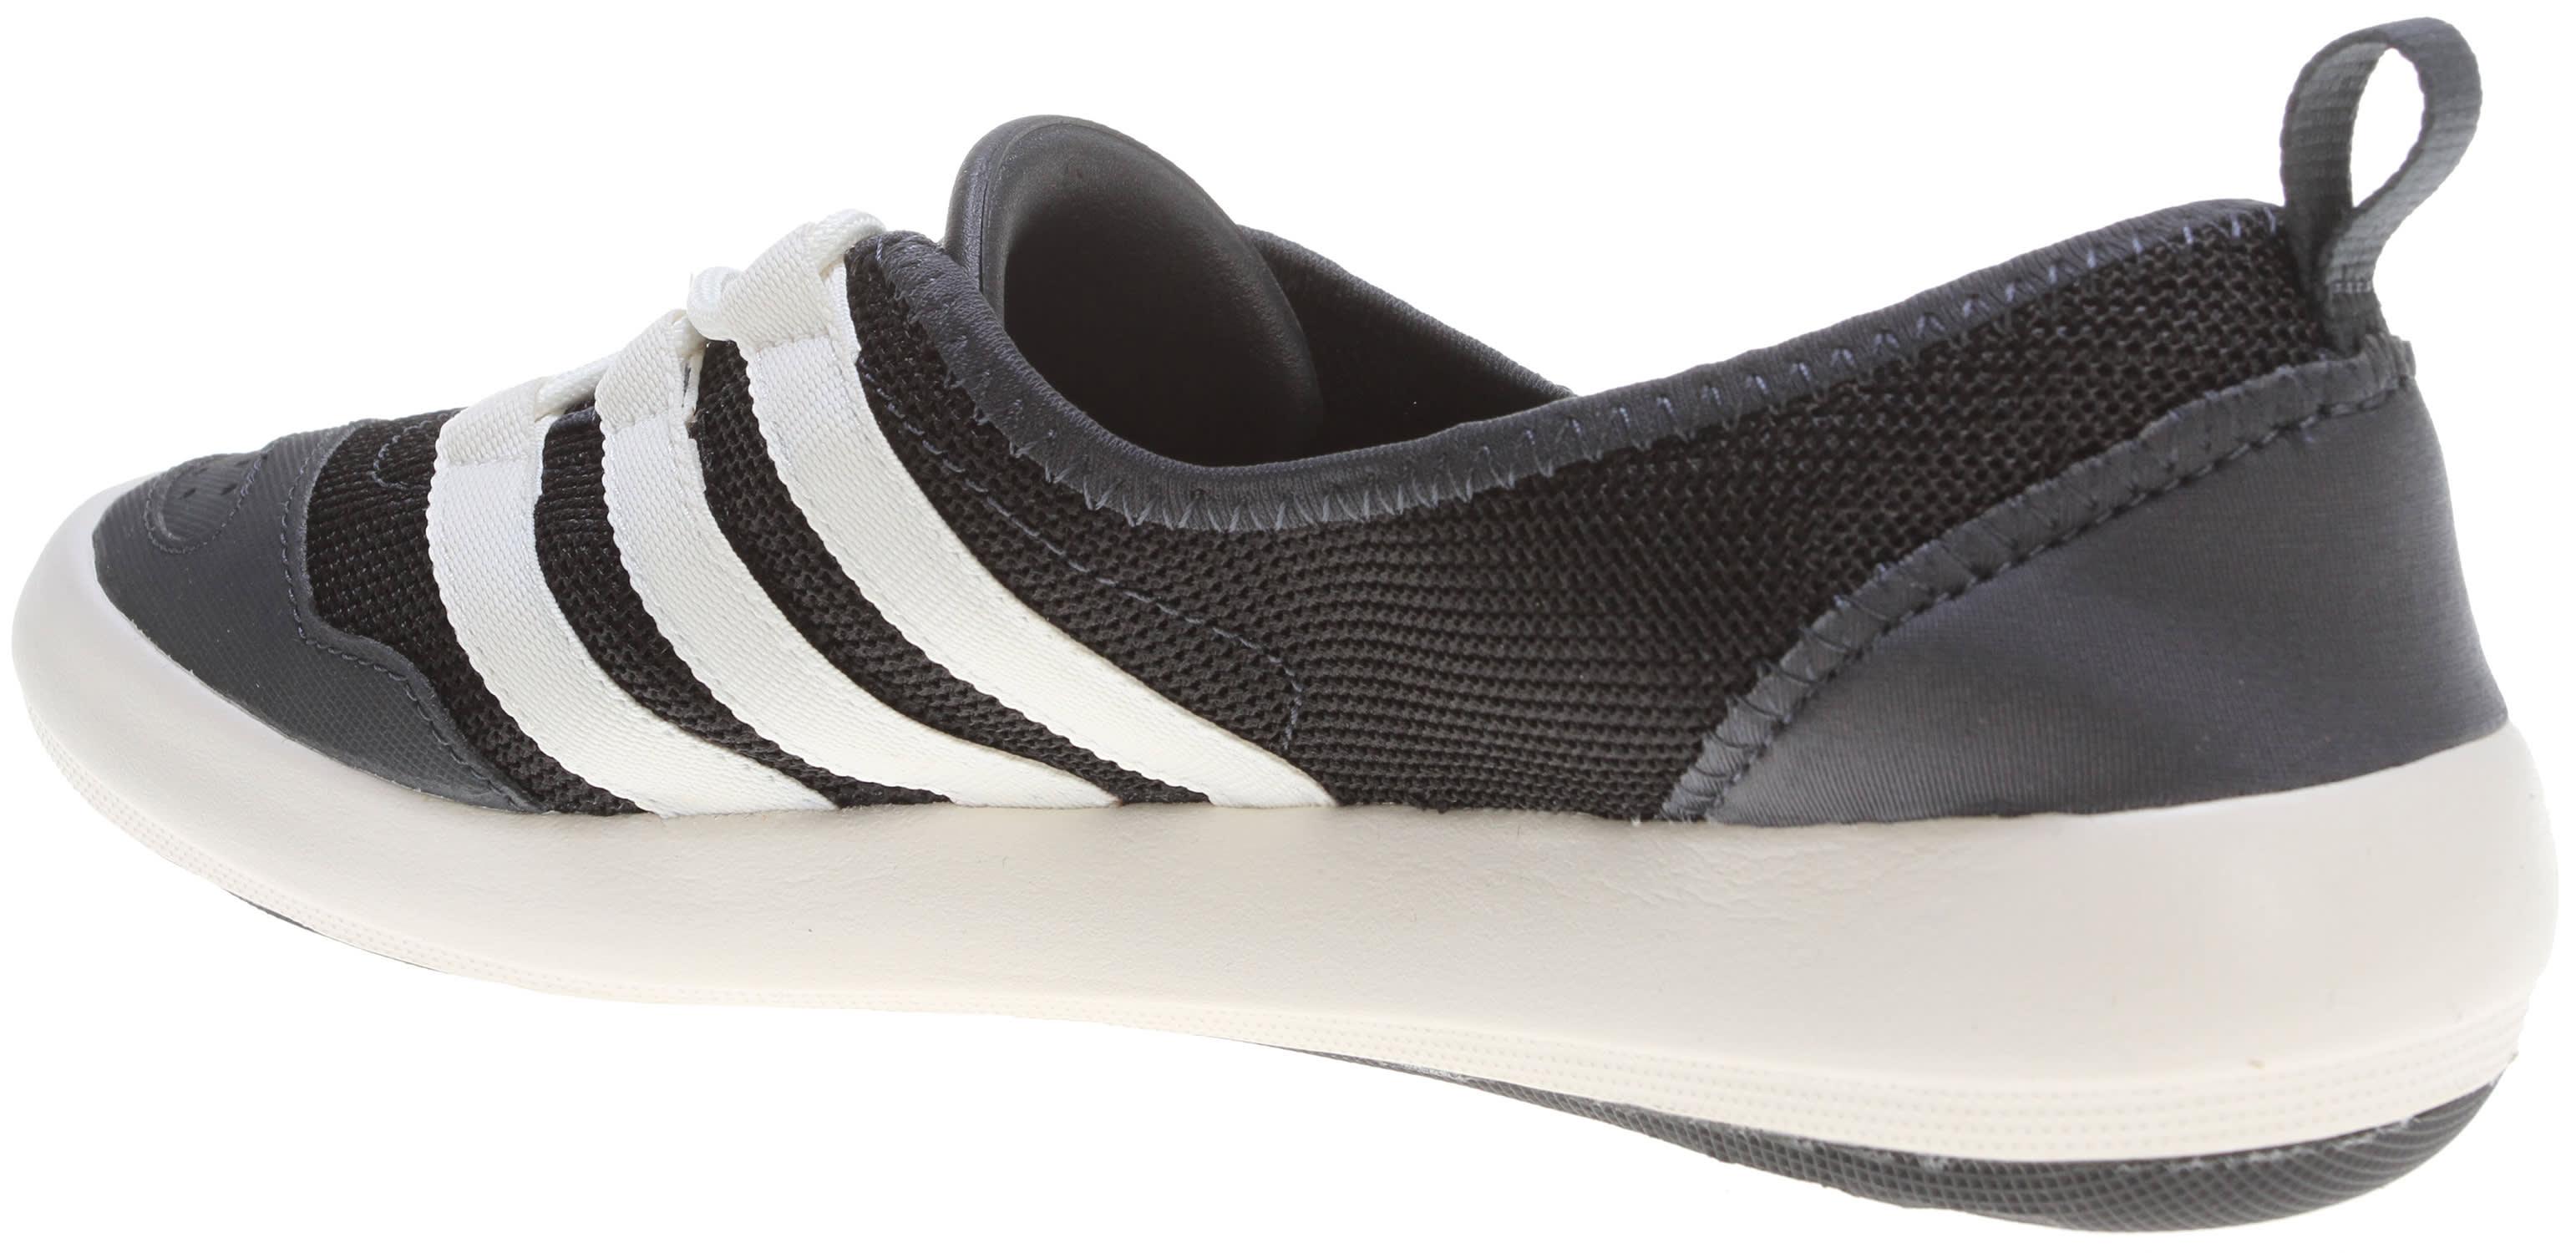 new concept d18e3 b6088 Adidas Climacool Boat Sleek Water Shoes - thumbnail 3